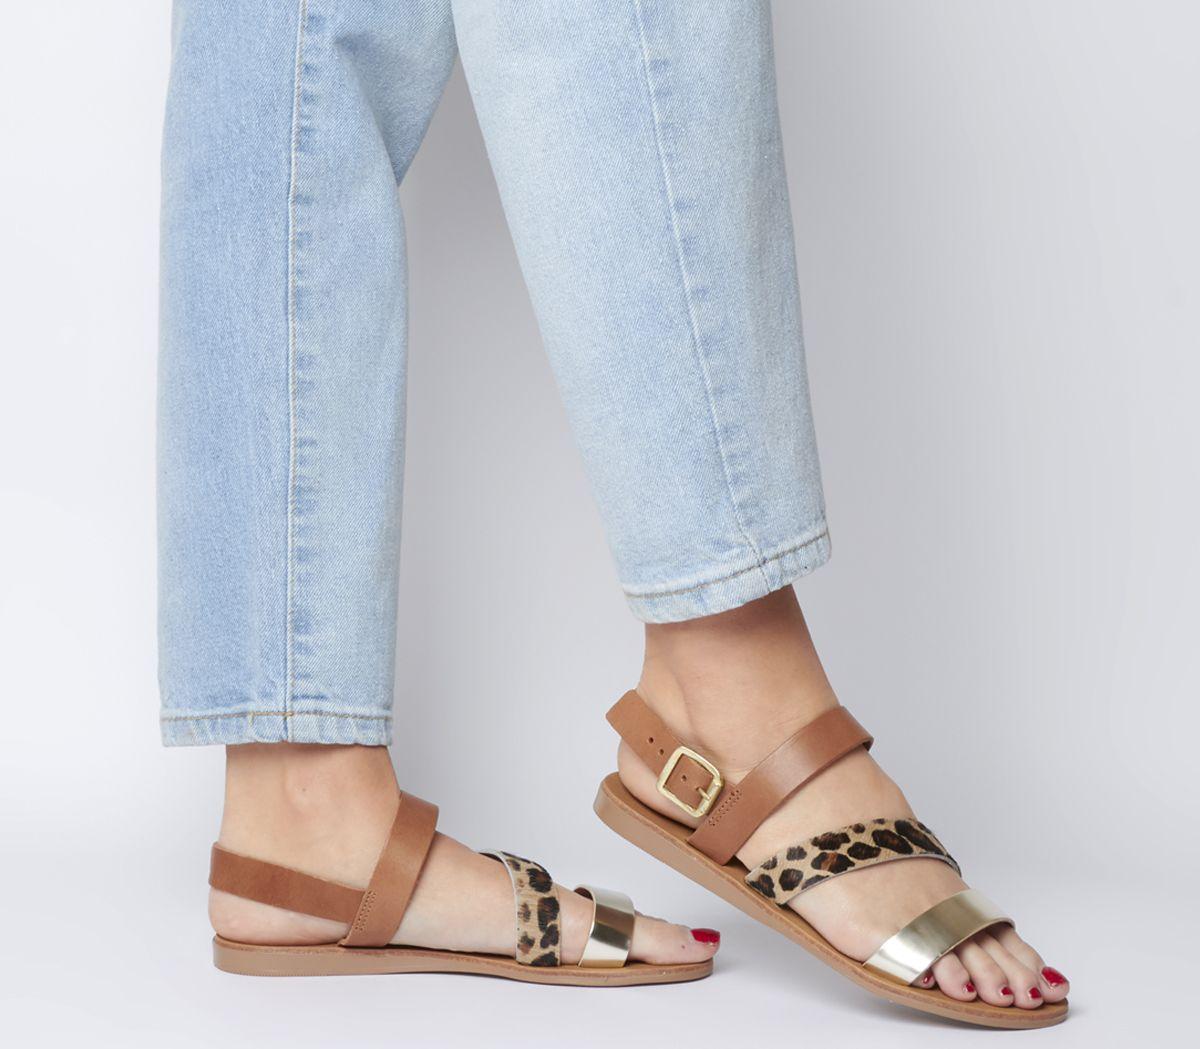 Office Sweet Heart Asymmetric Strap Sandals Tan Leather Leopard Gold Mix